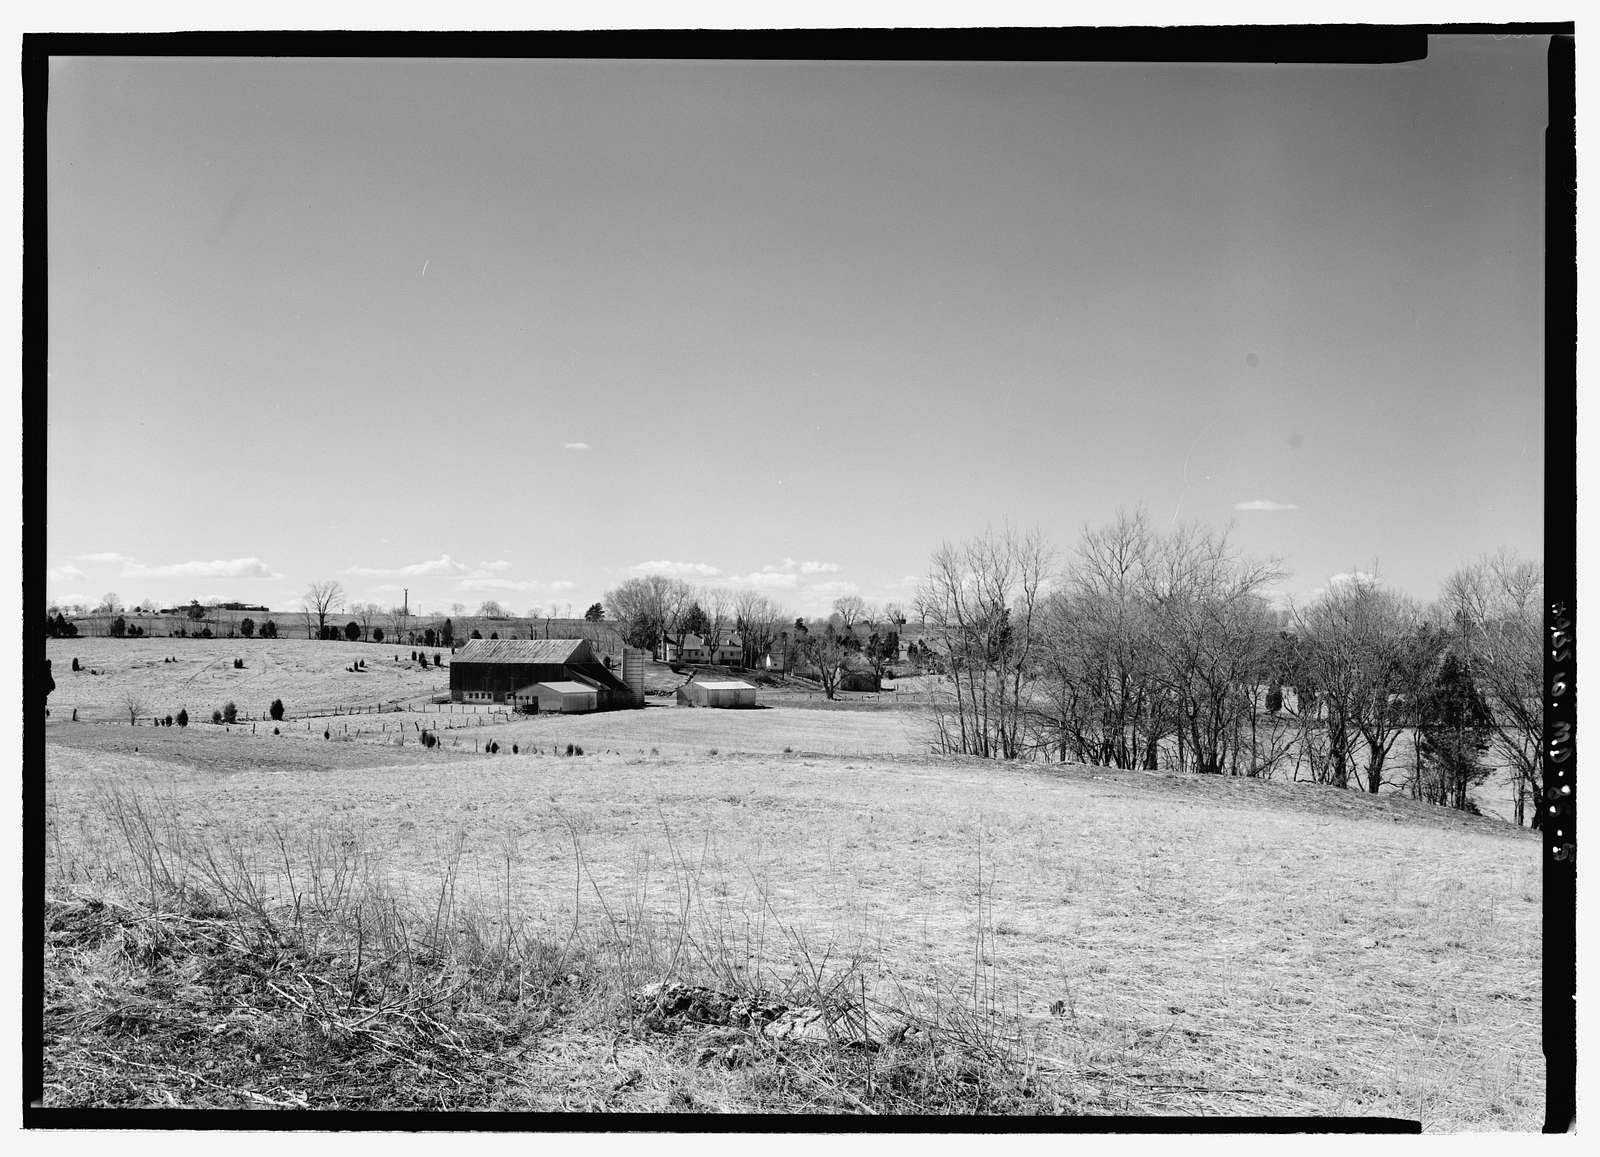 Roulette Farm, House, Sharpsburg, Washington County, MD